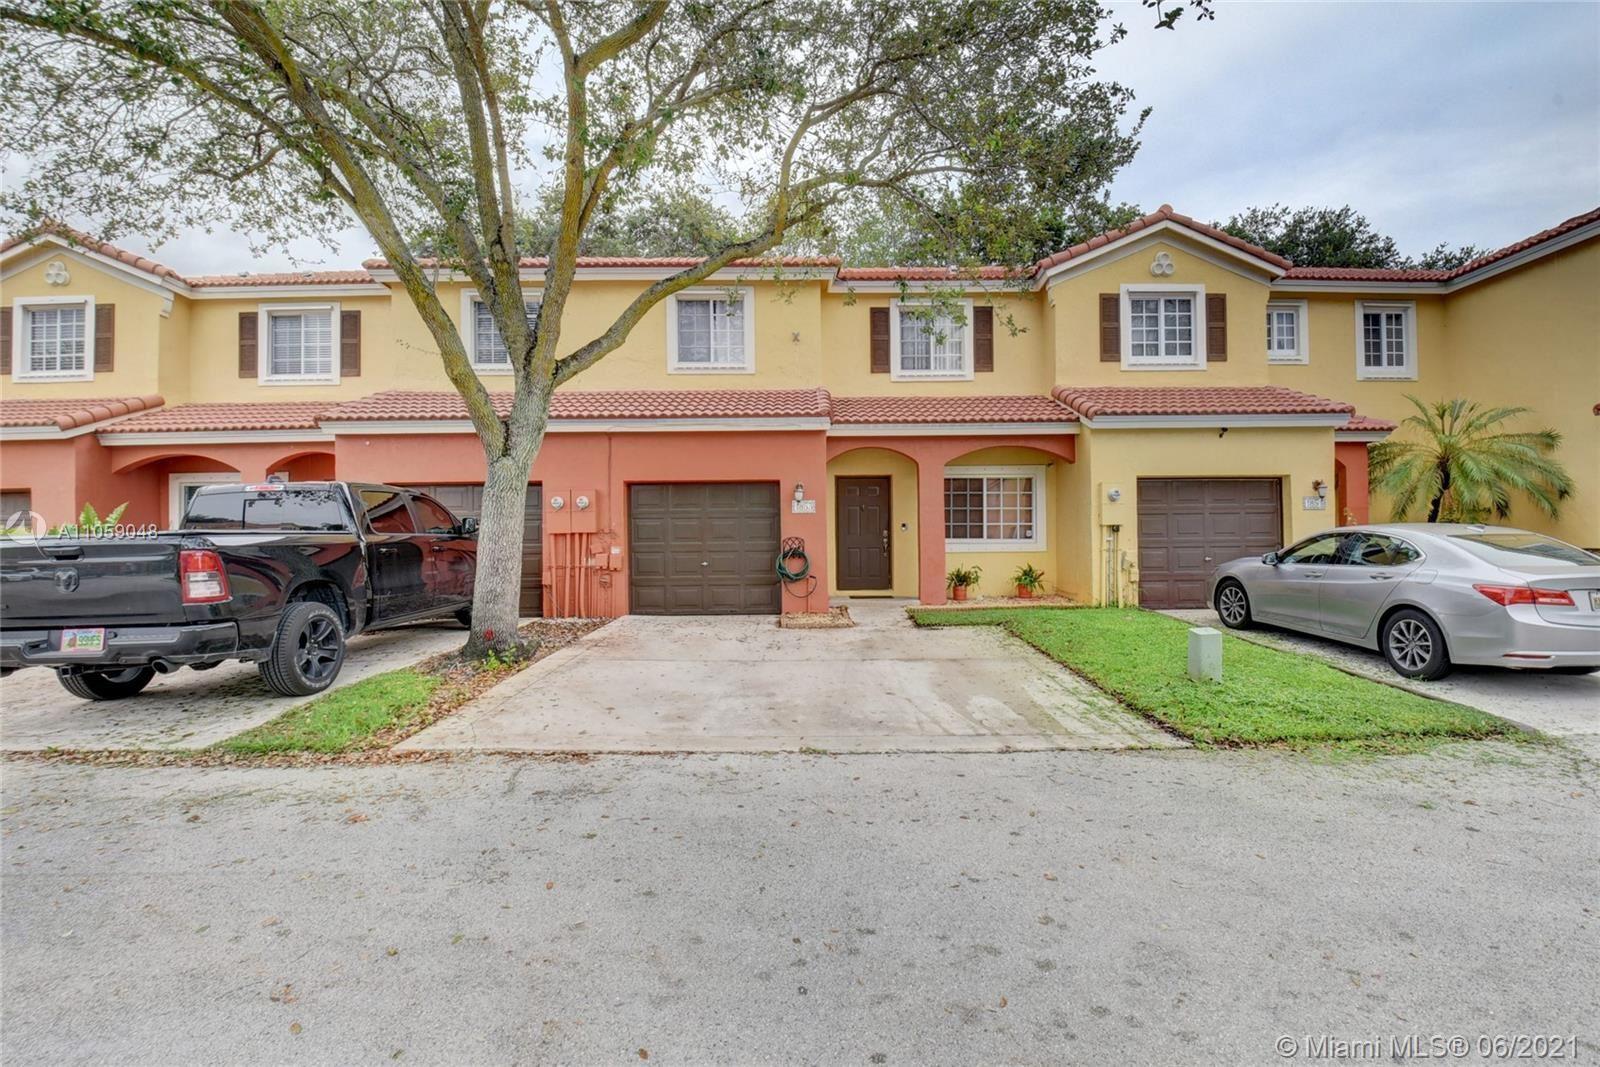 1853 SW 103rd Ave #1853, Miramar, FL 33025 - #: A11059048